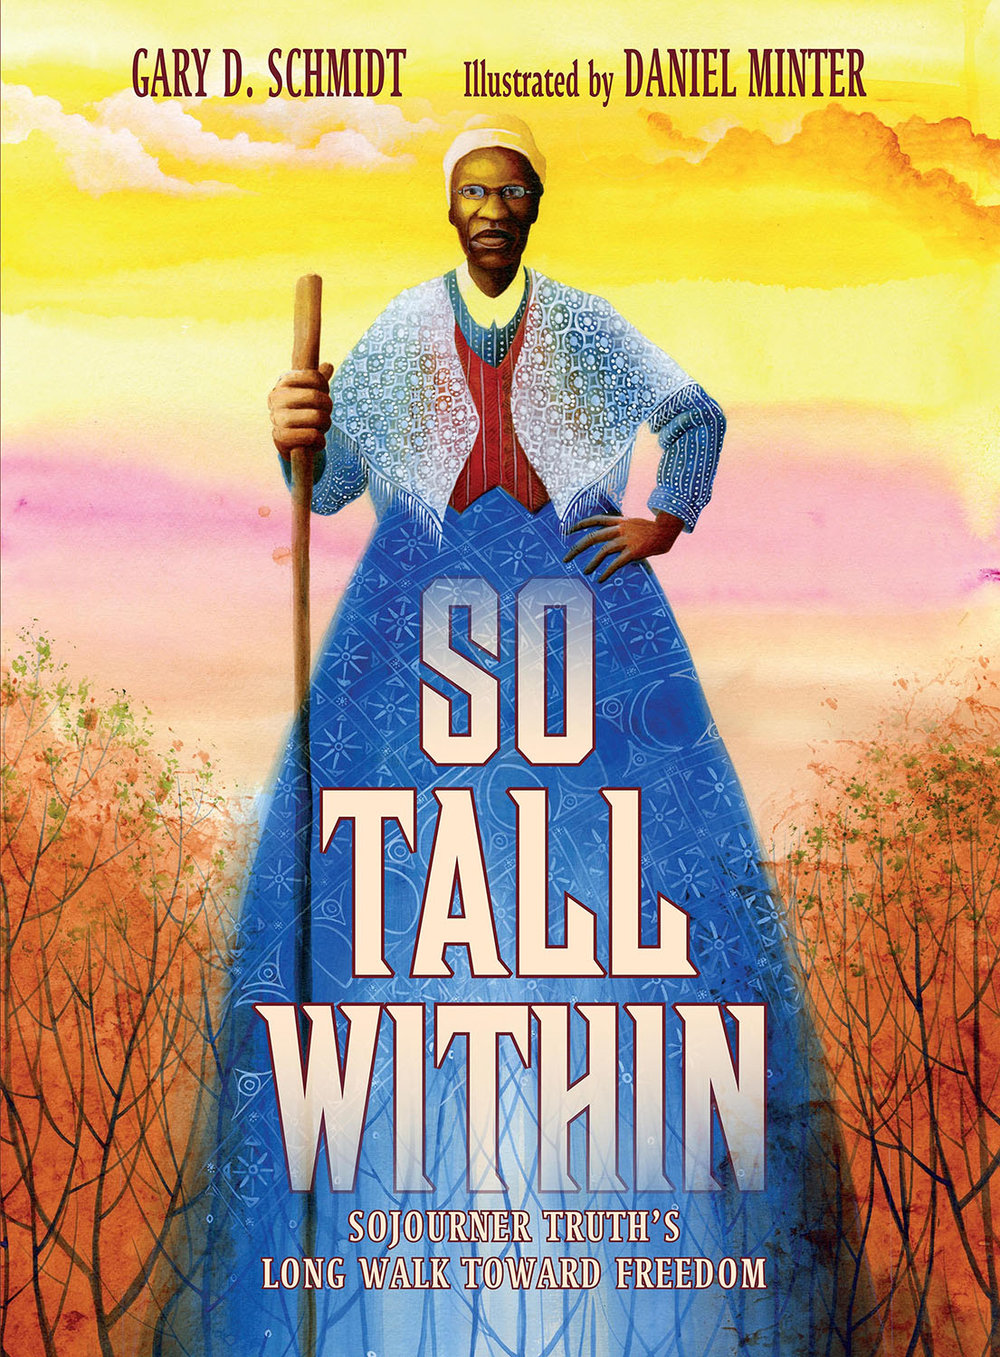 Schmidt, So Tall Within.jpg